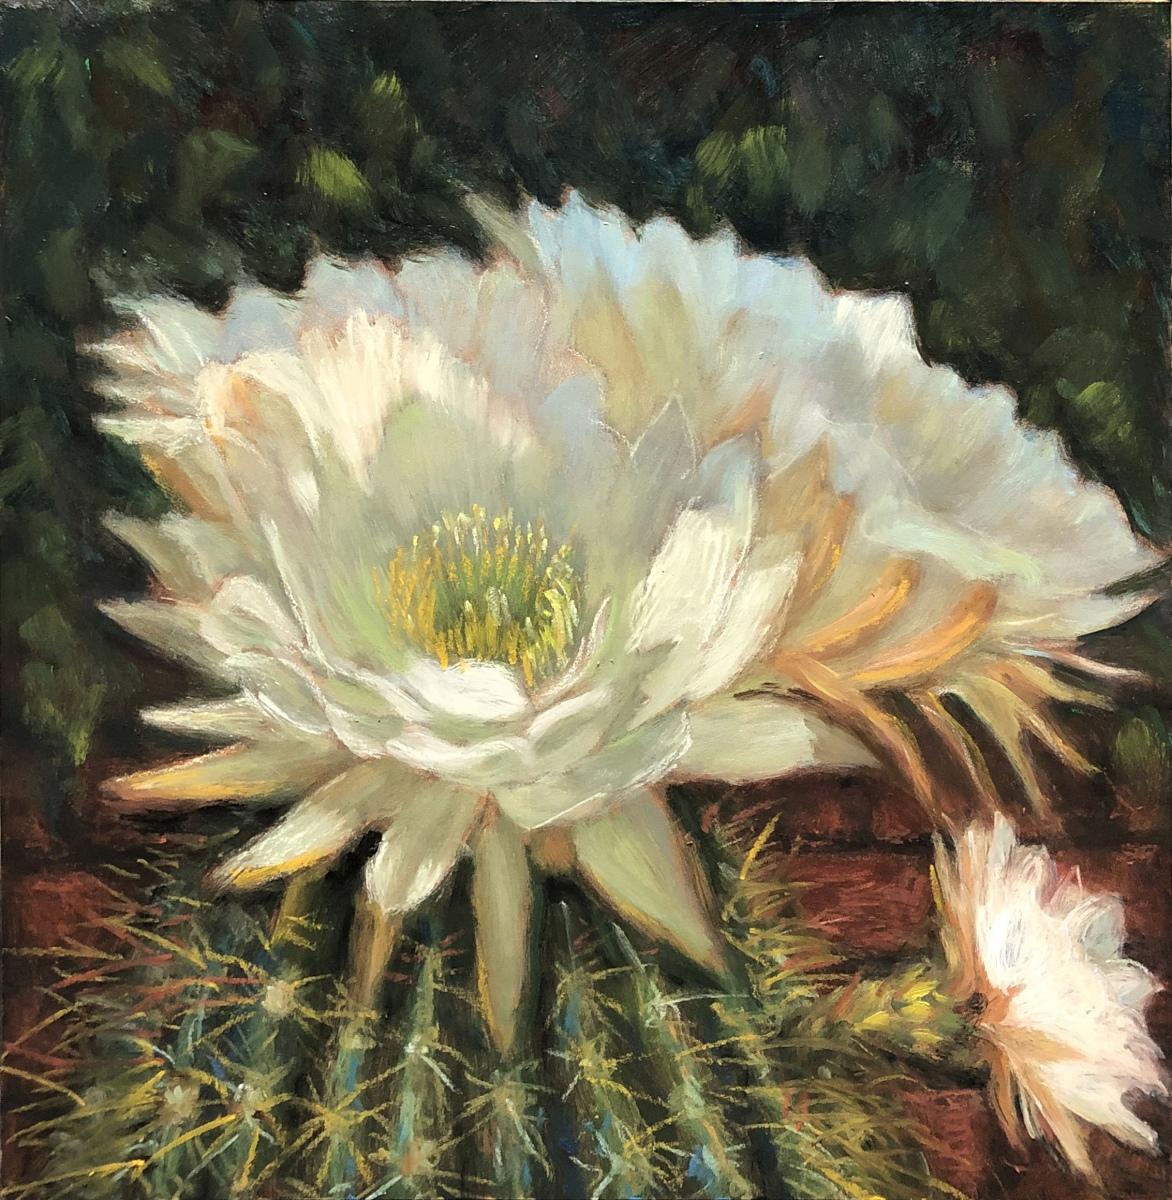 2020 Barrel Cactus Bloom 10x10 oil on panel